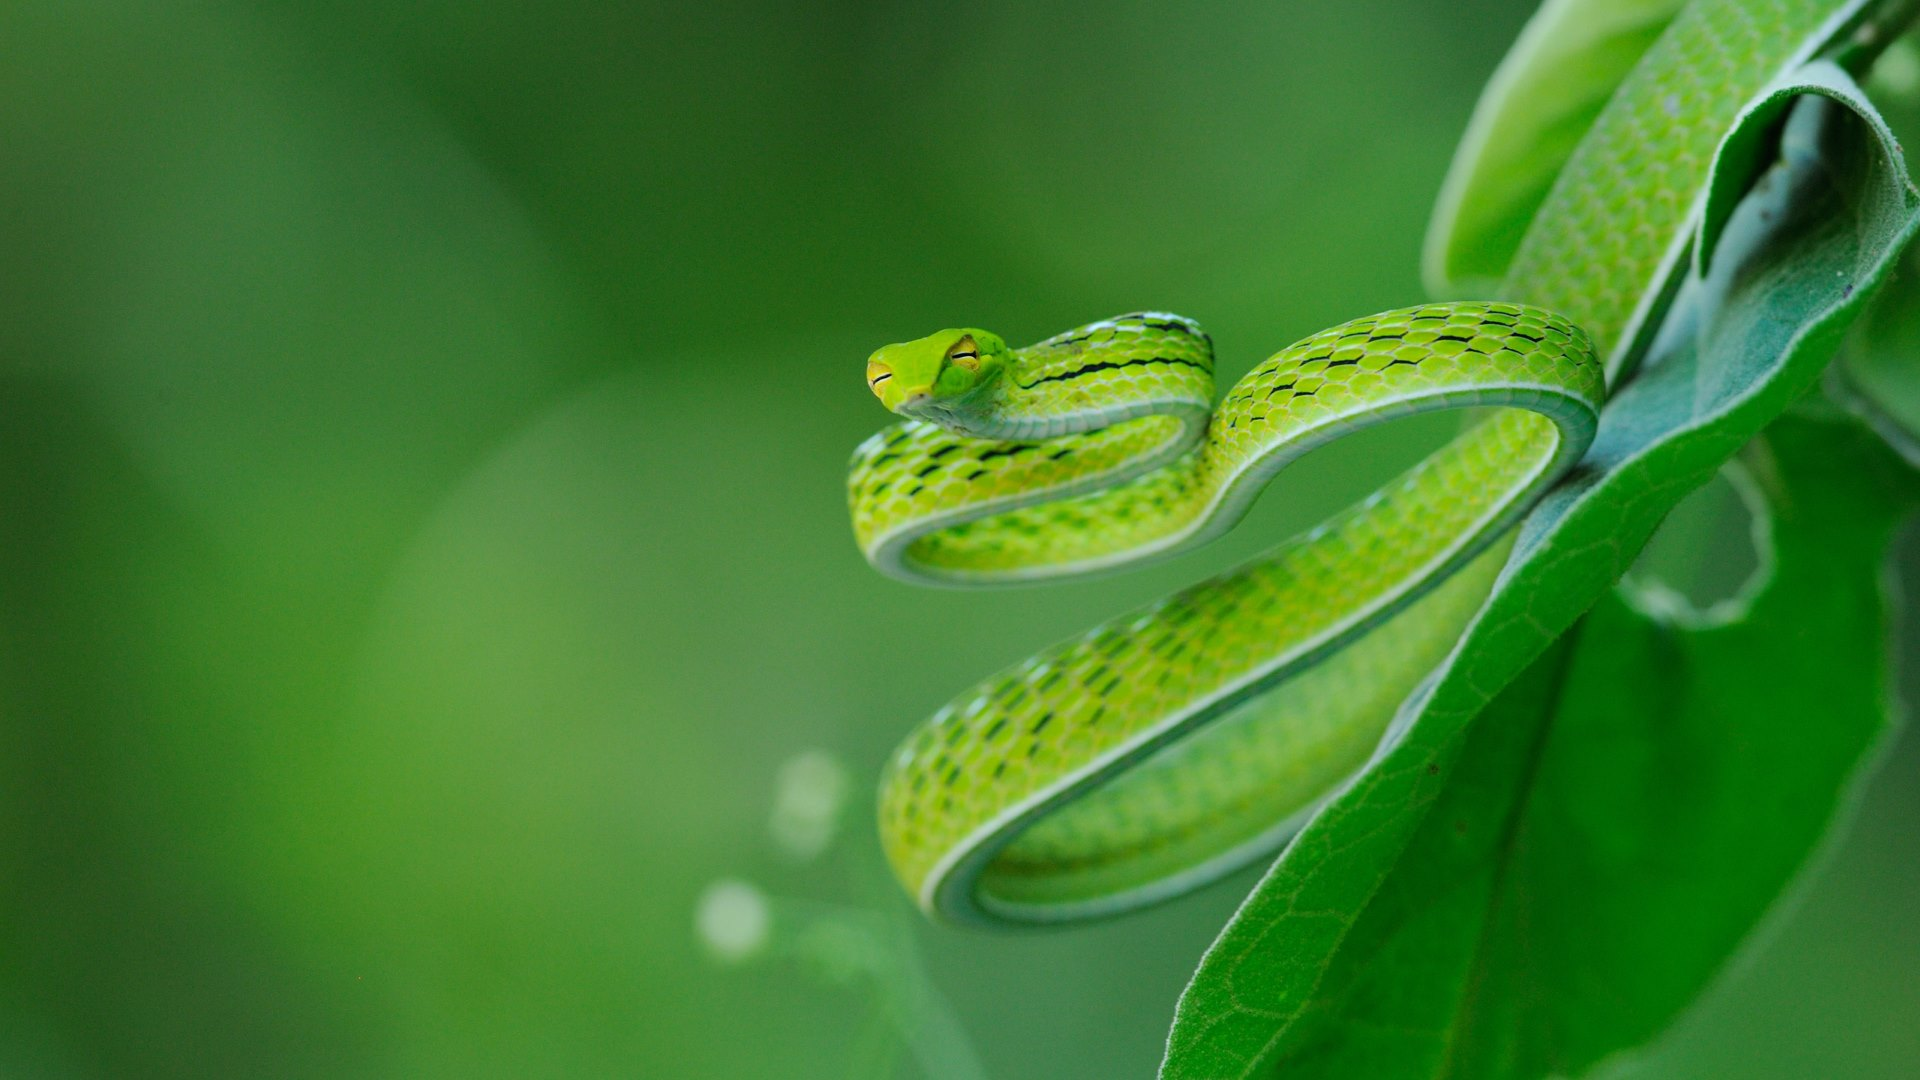 Pit viper snake wallpaper - photo#8